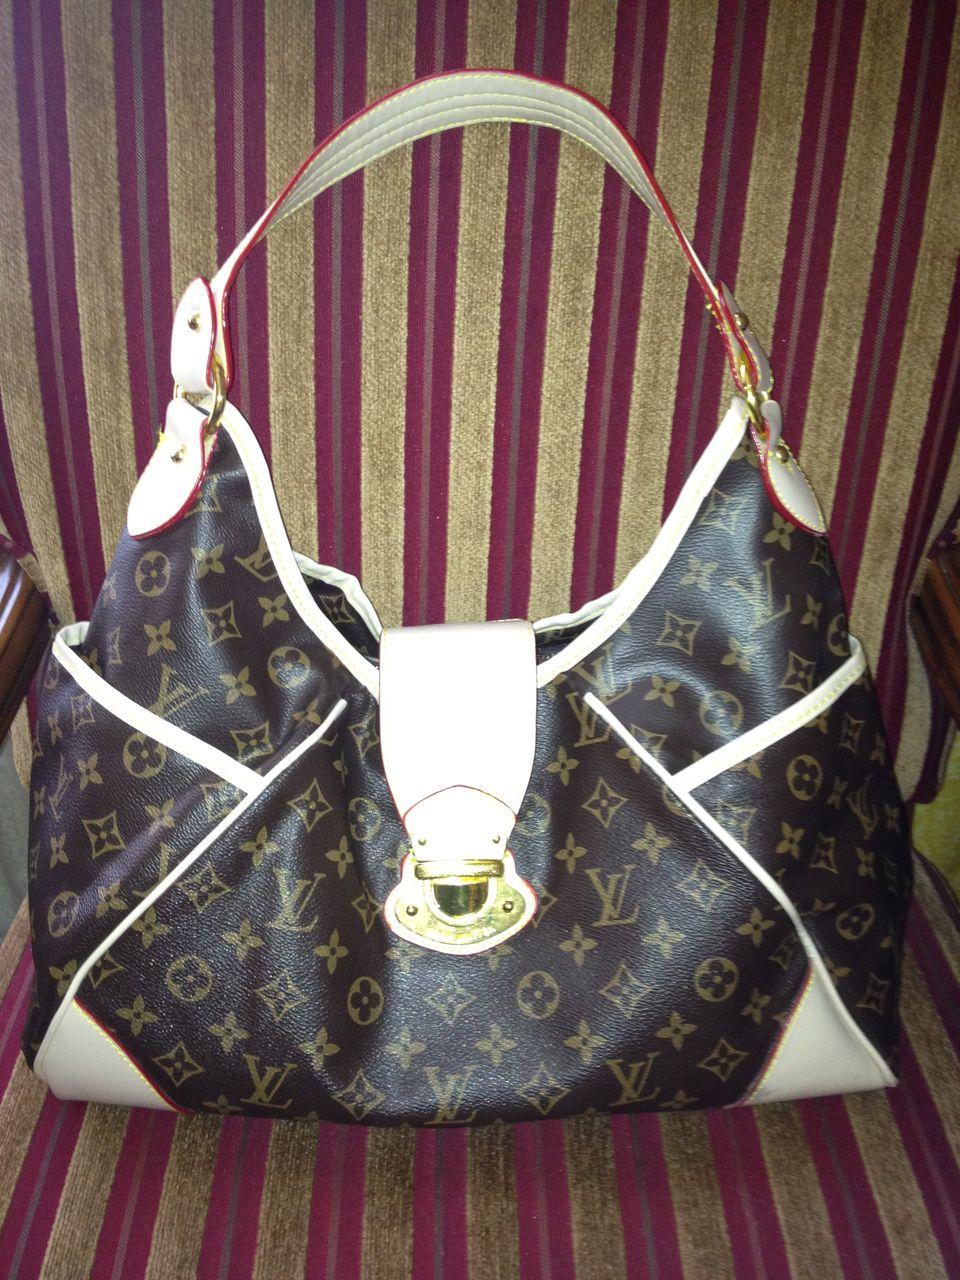 Vinyl 'Louis Vuitton' Fashion Purse